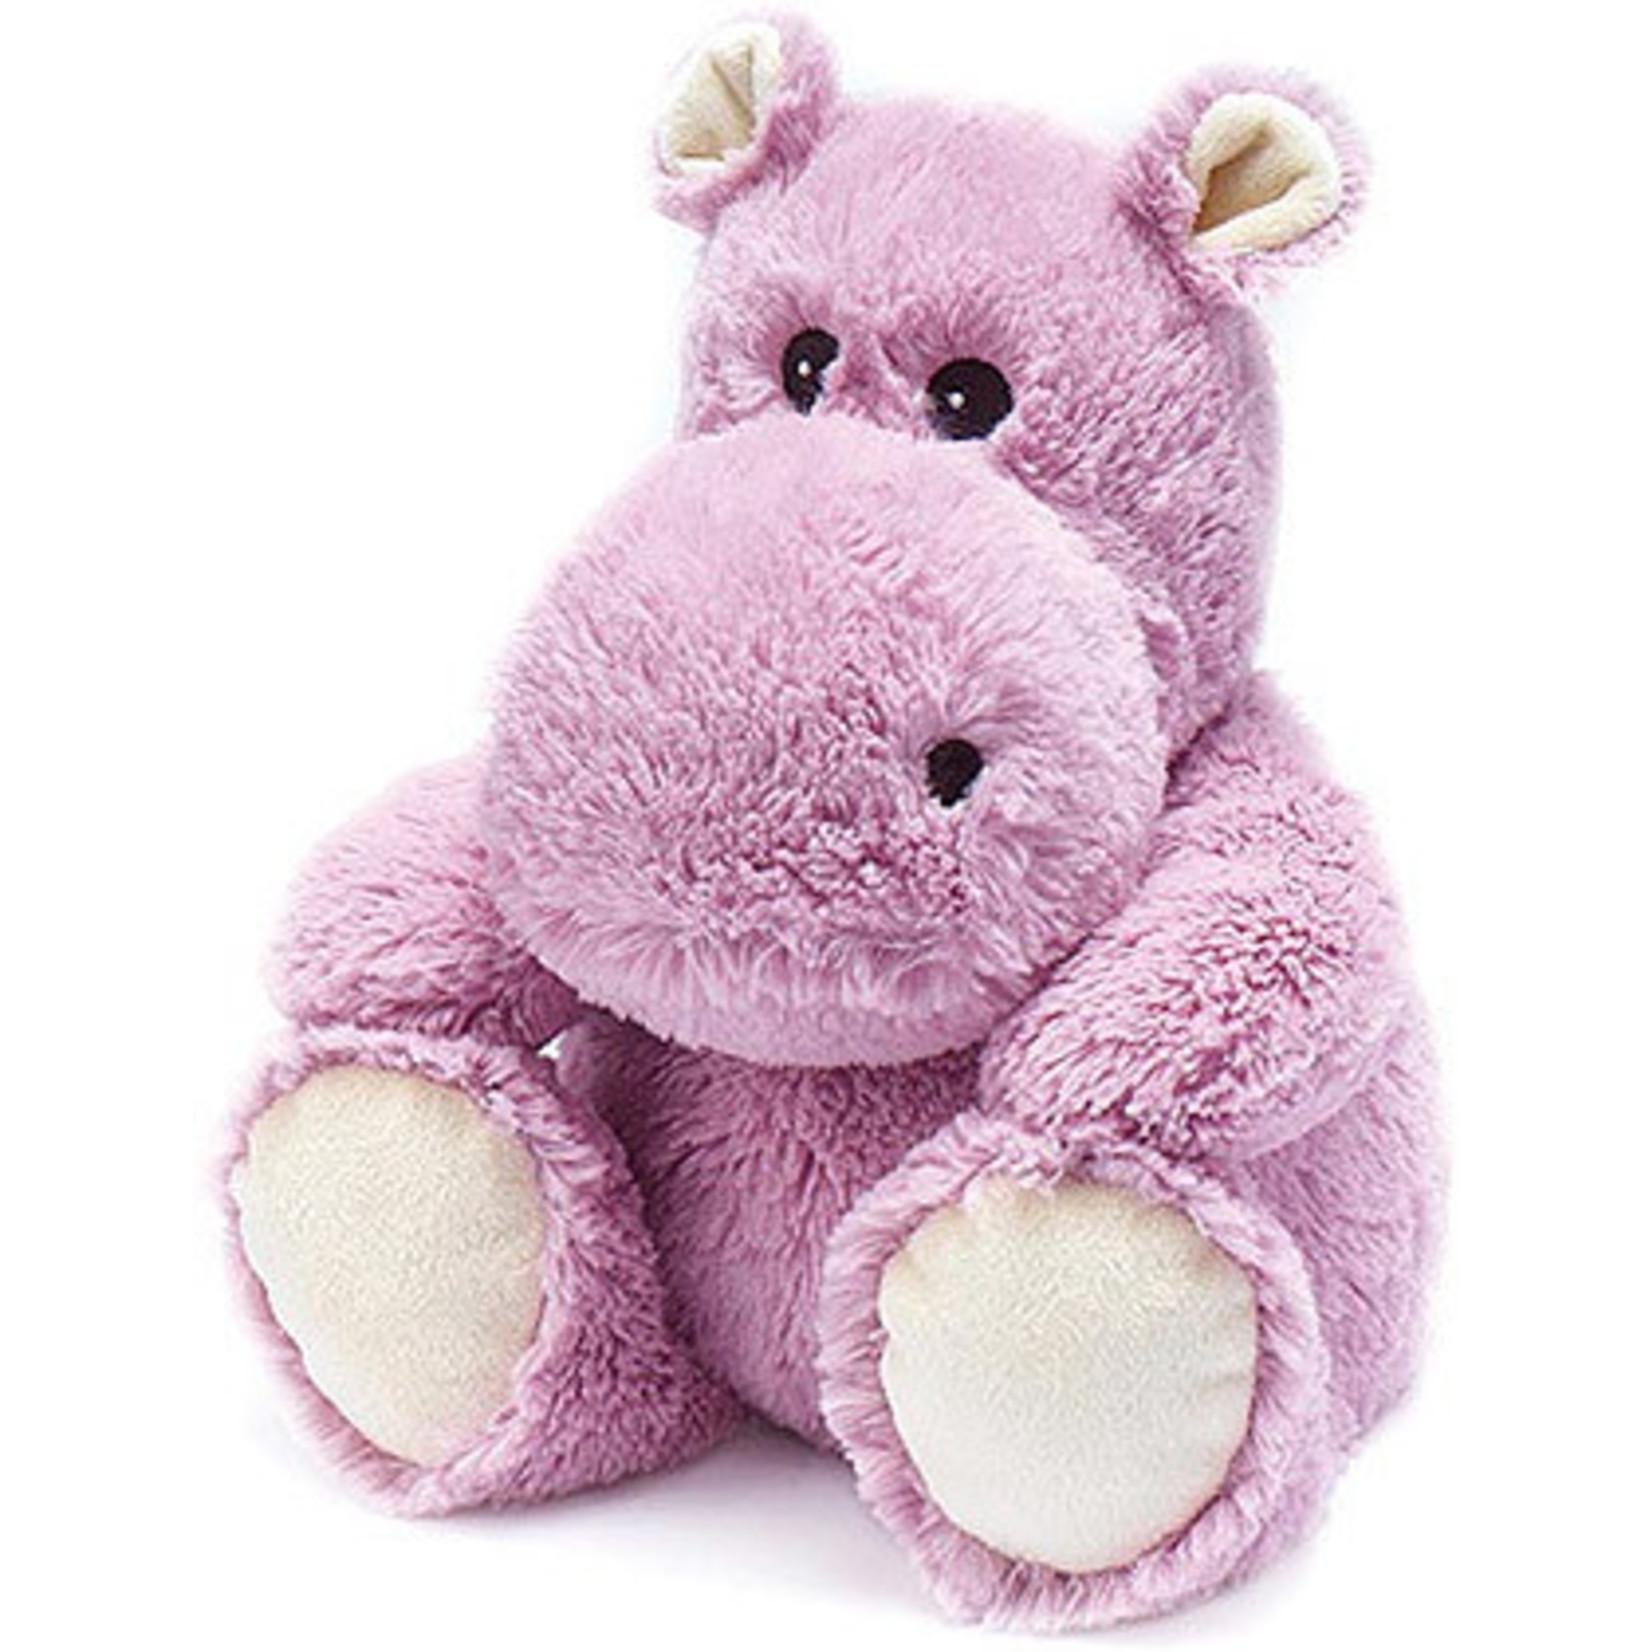 Intelex Big Hippo Cozy Plush